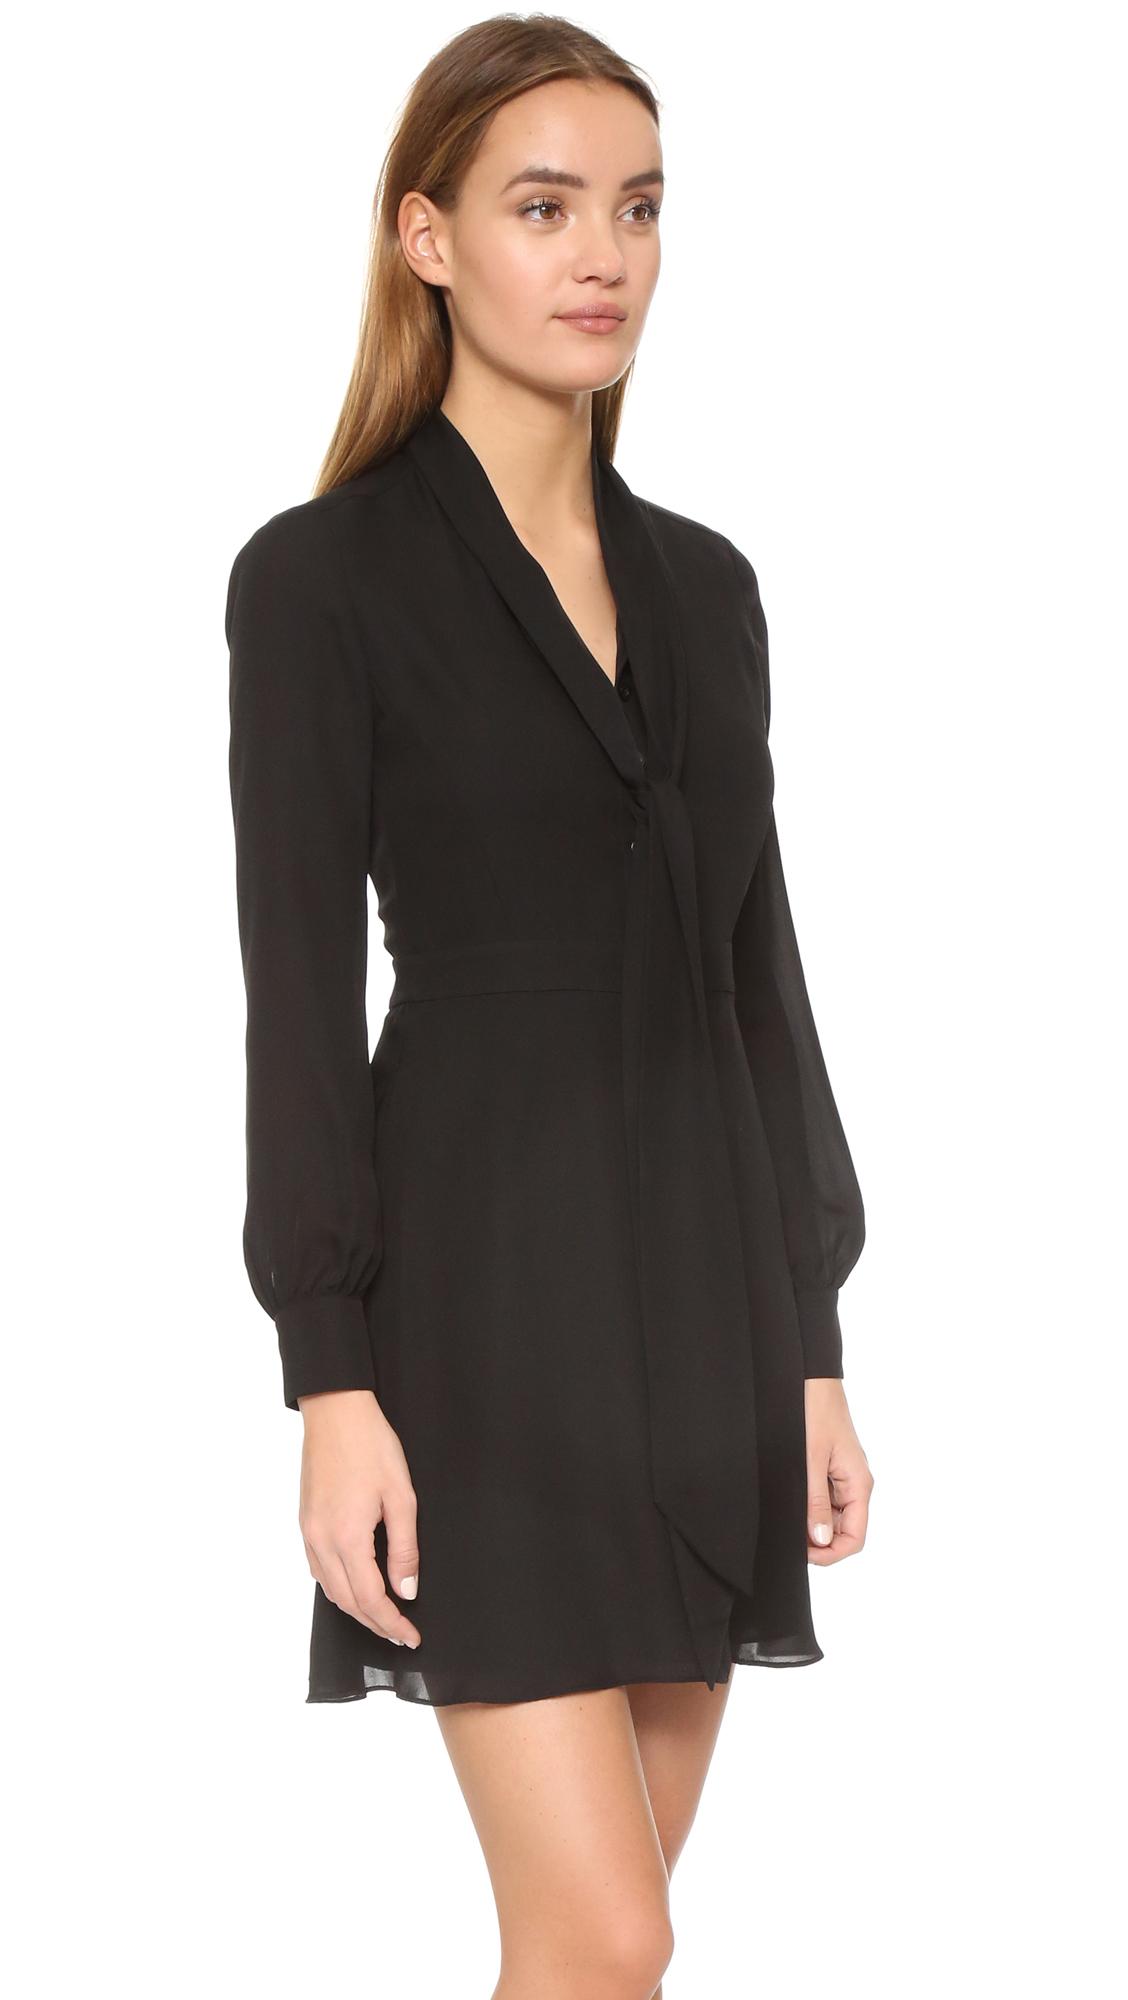 Rebecca Minkoff Scarlet Tie Neck Dress In Black